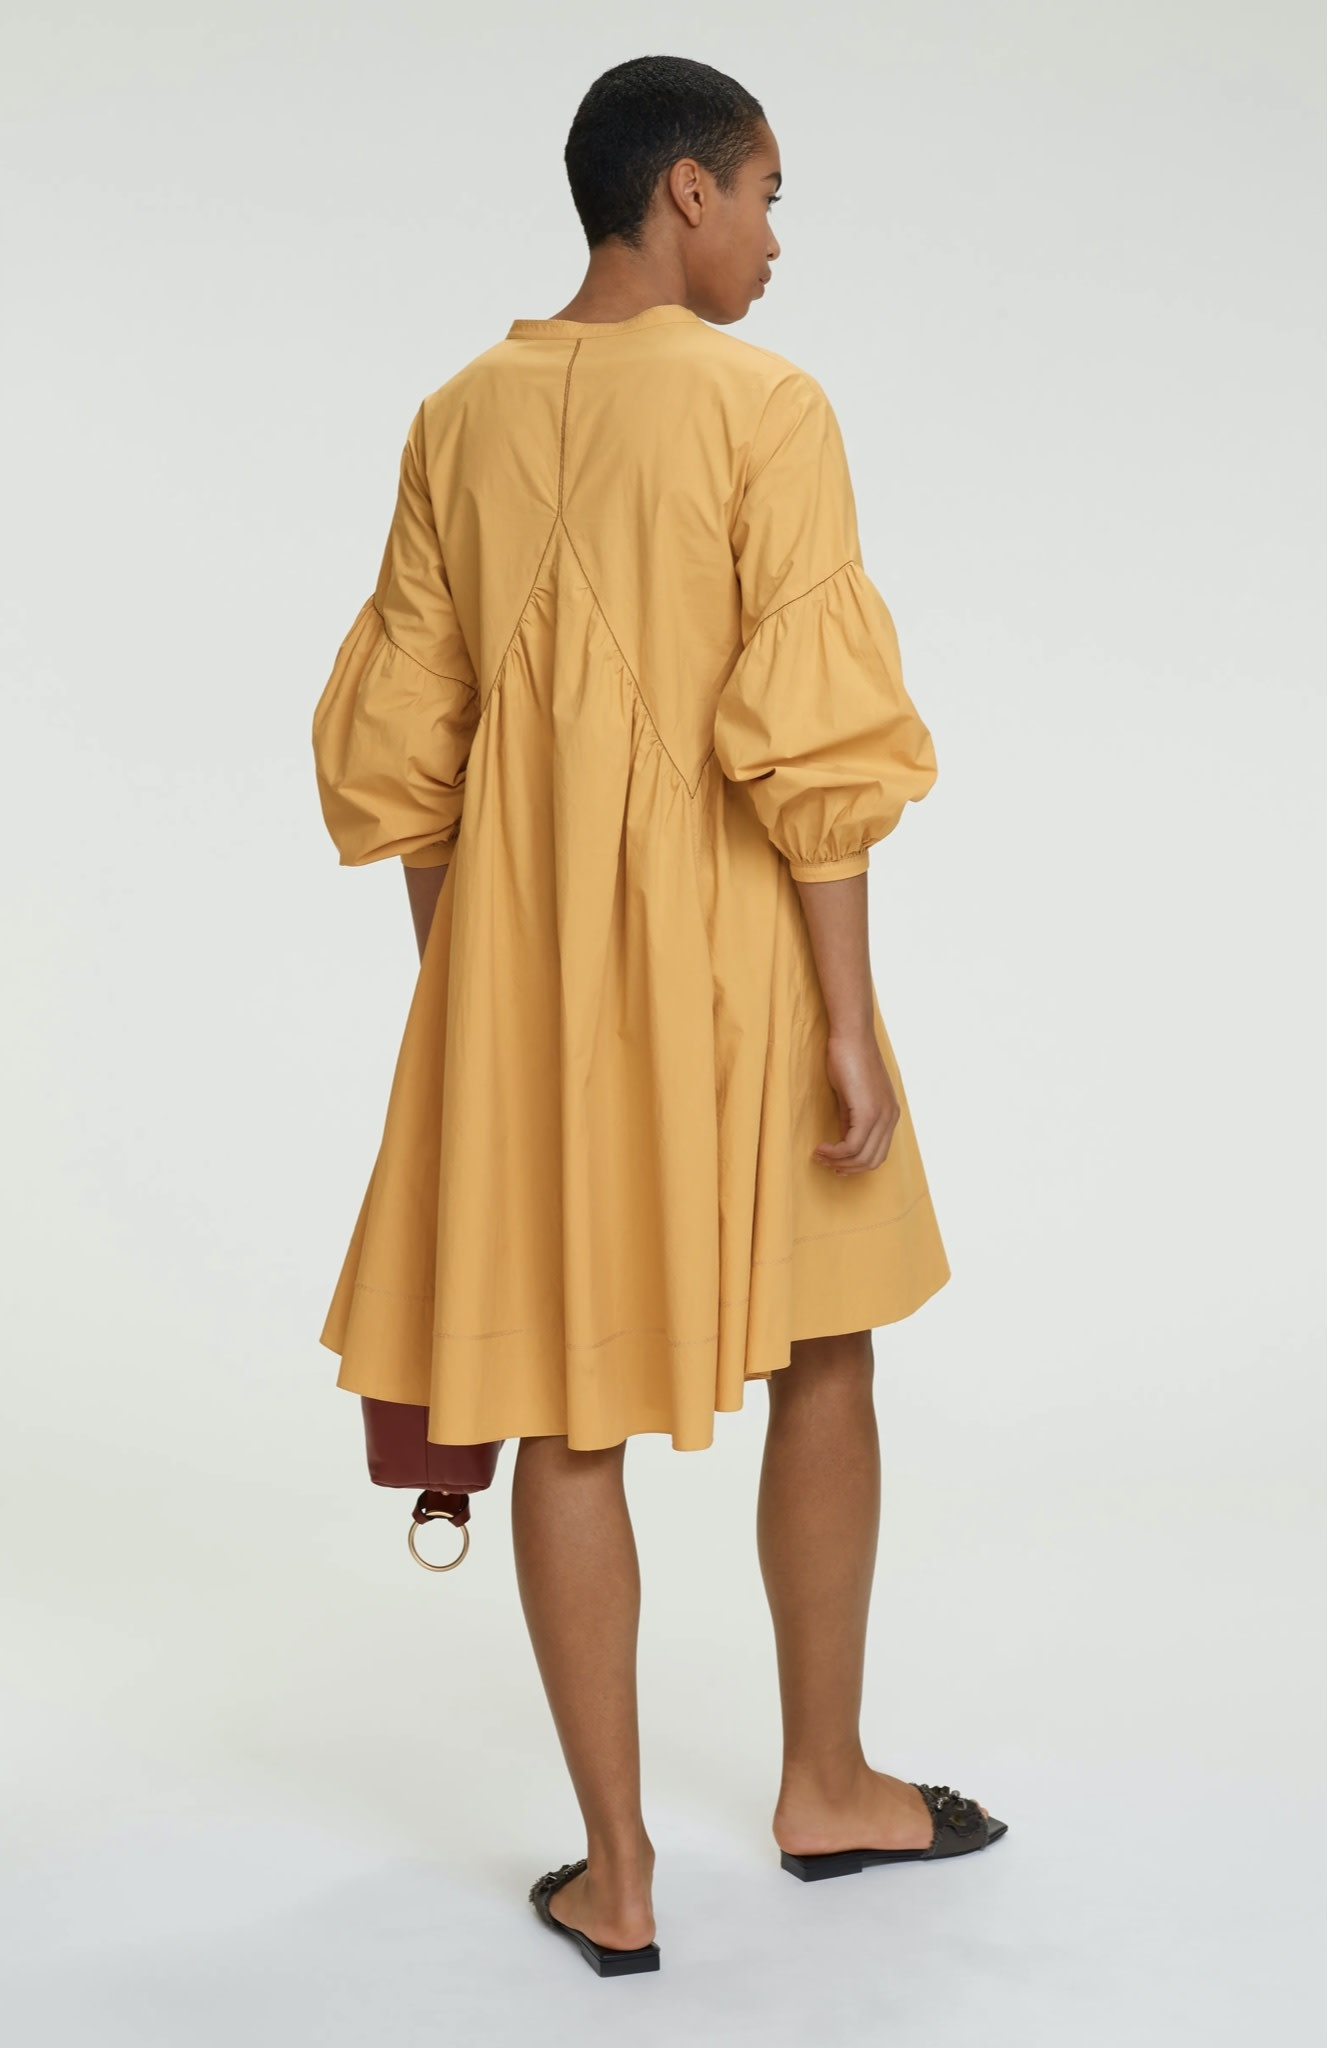 Popeline power dress Dorothee schumacher-5